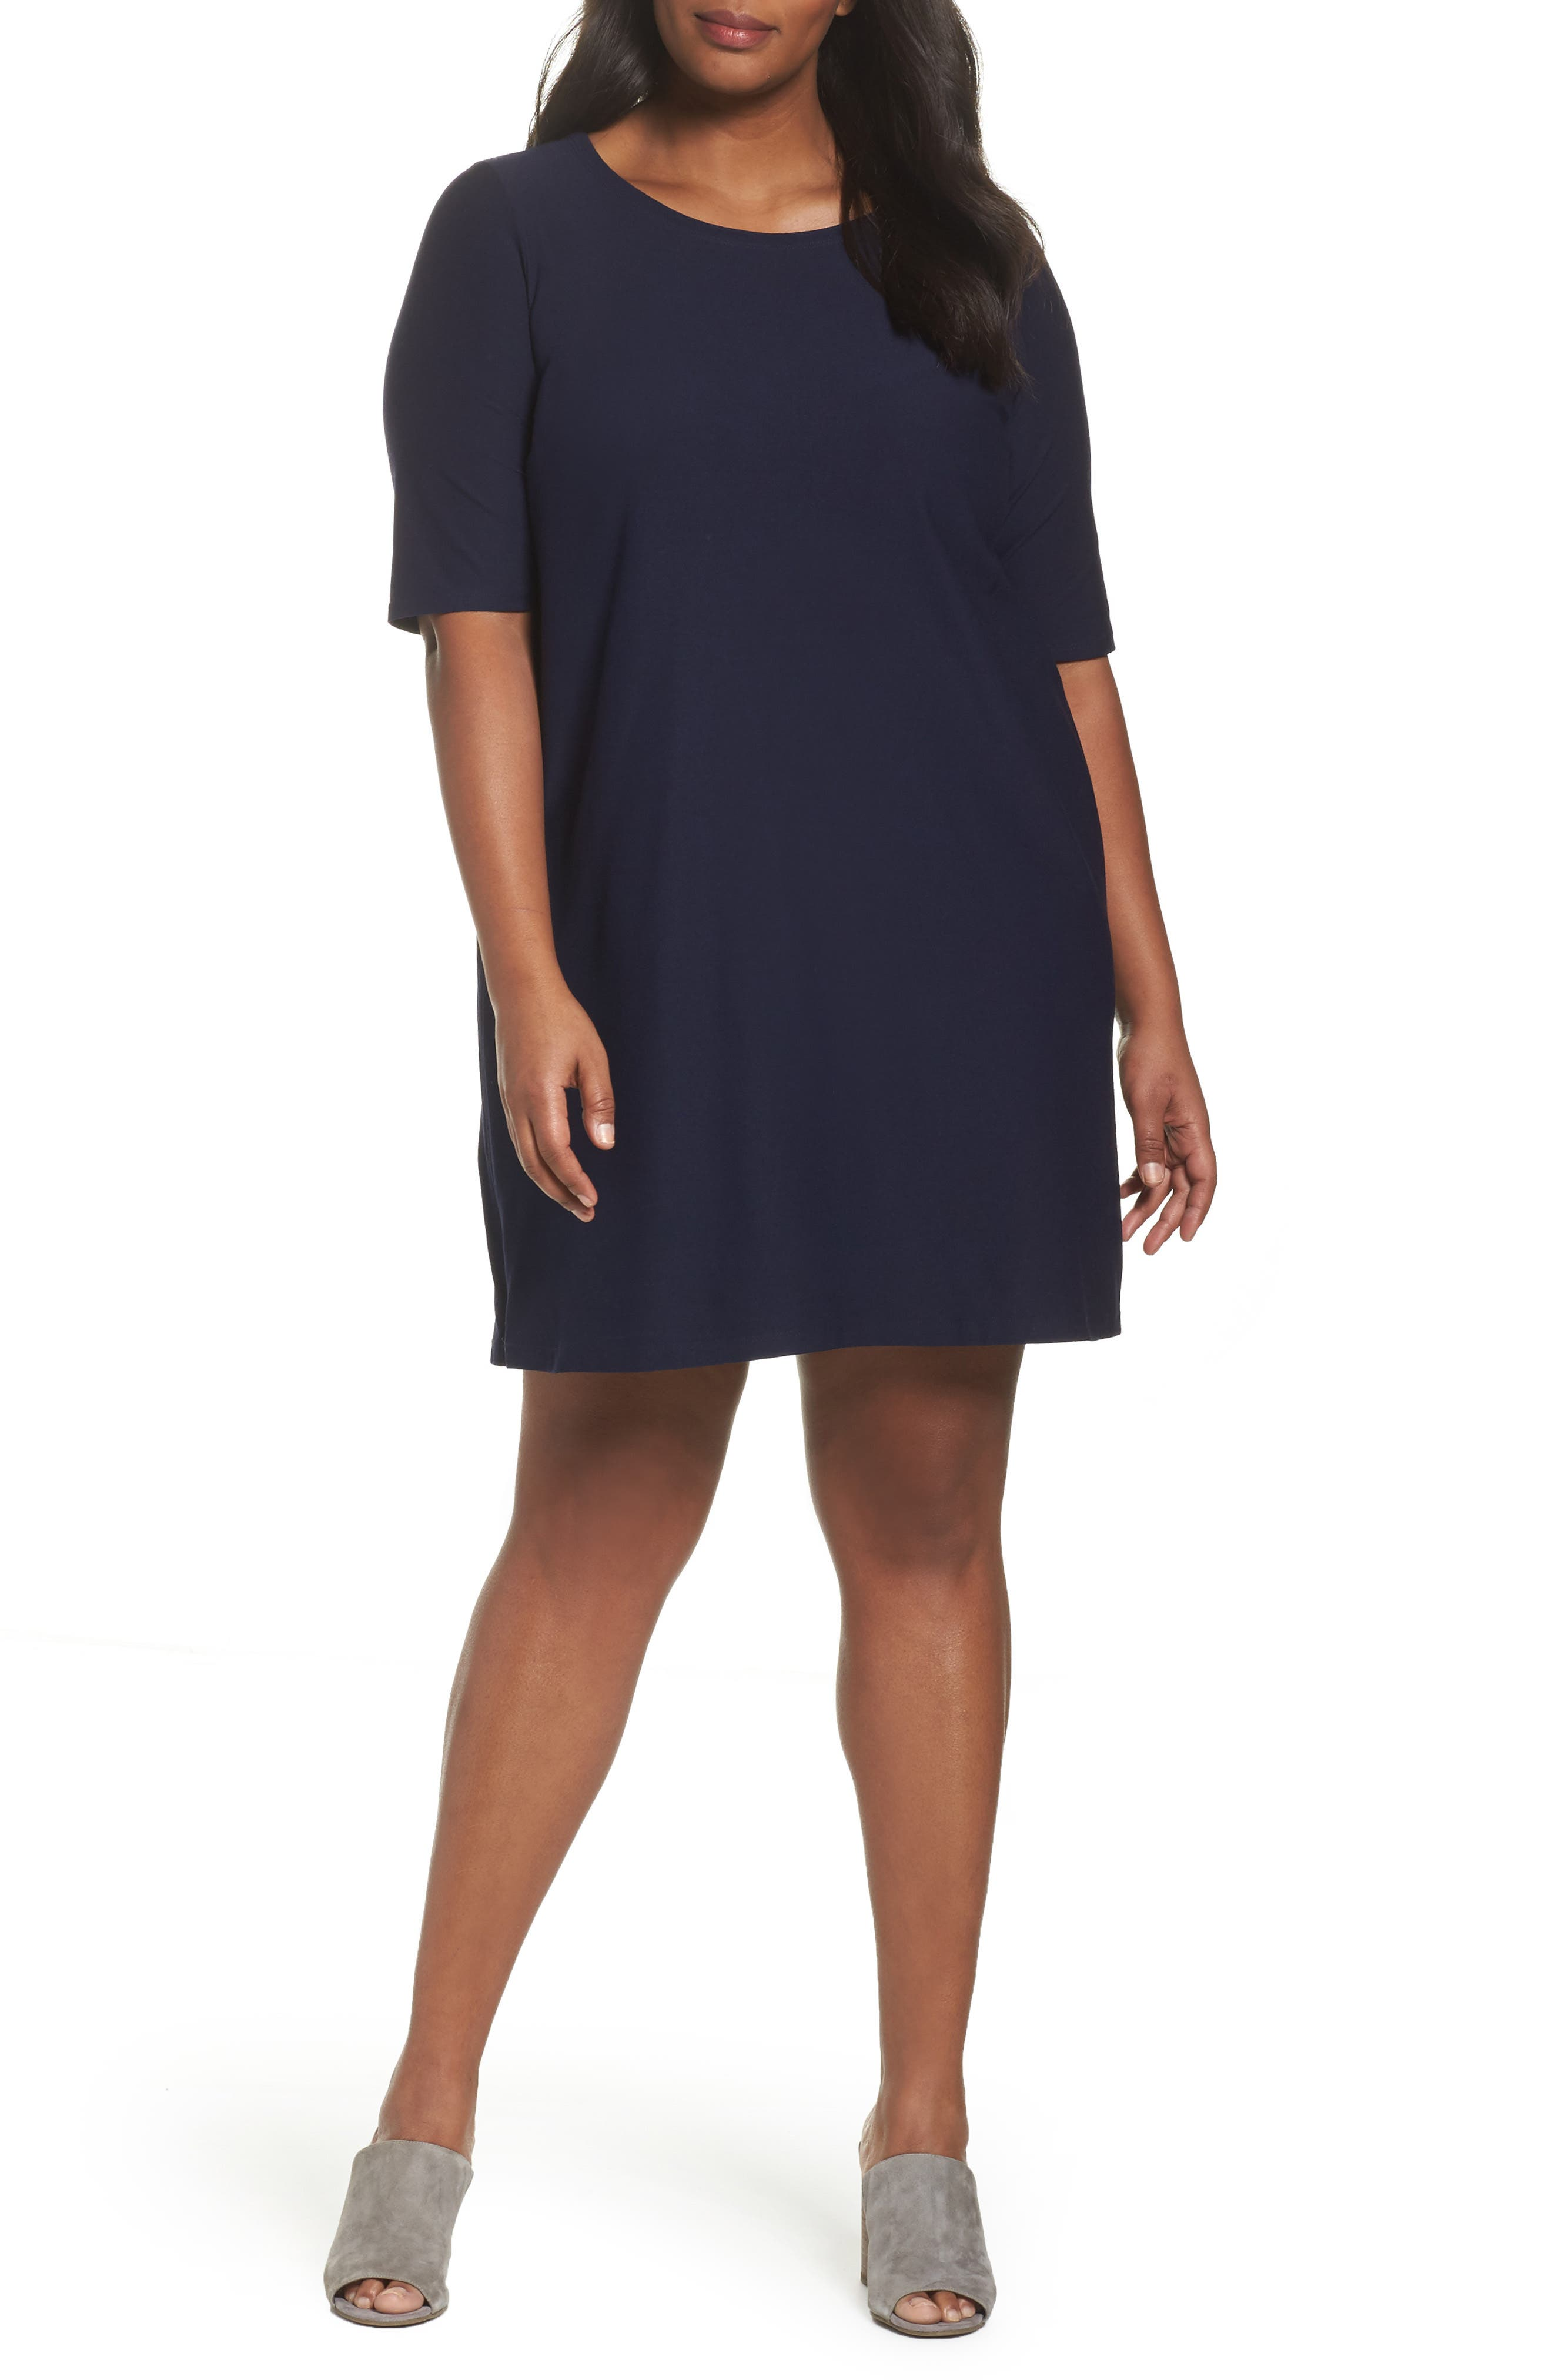 Alternate Image 1 Selected - Eileen Fisher Side Zip Knit Shift Dress (Plus Size)